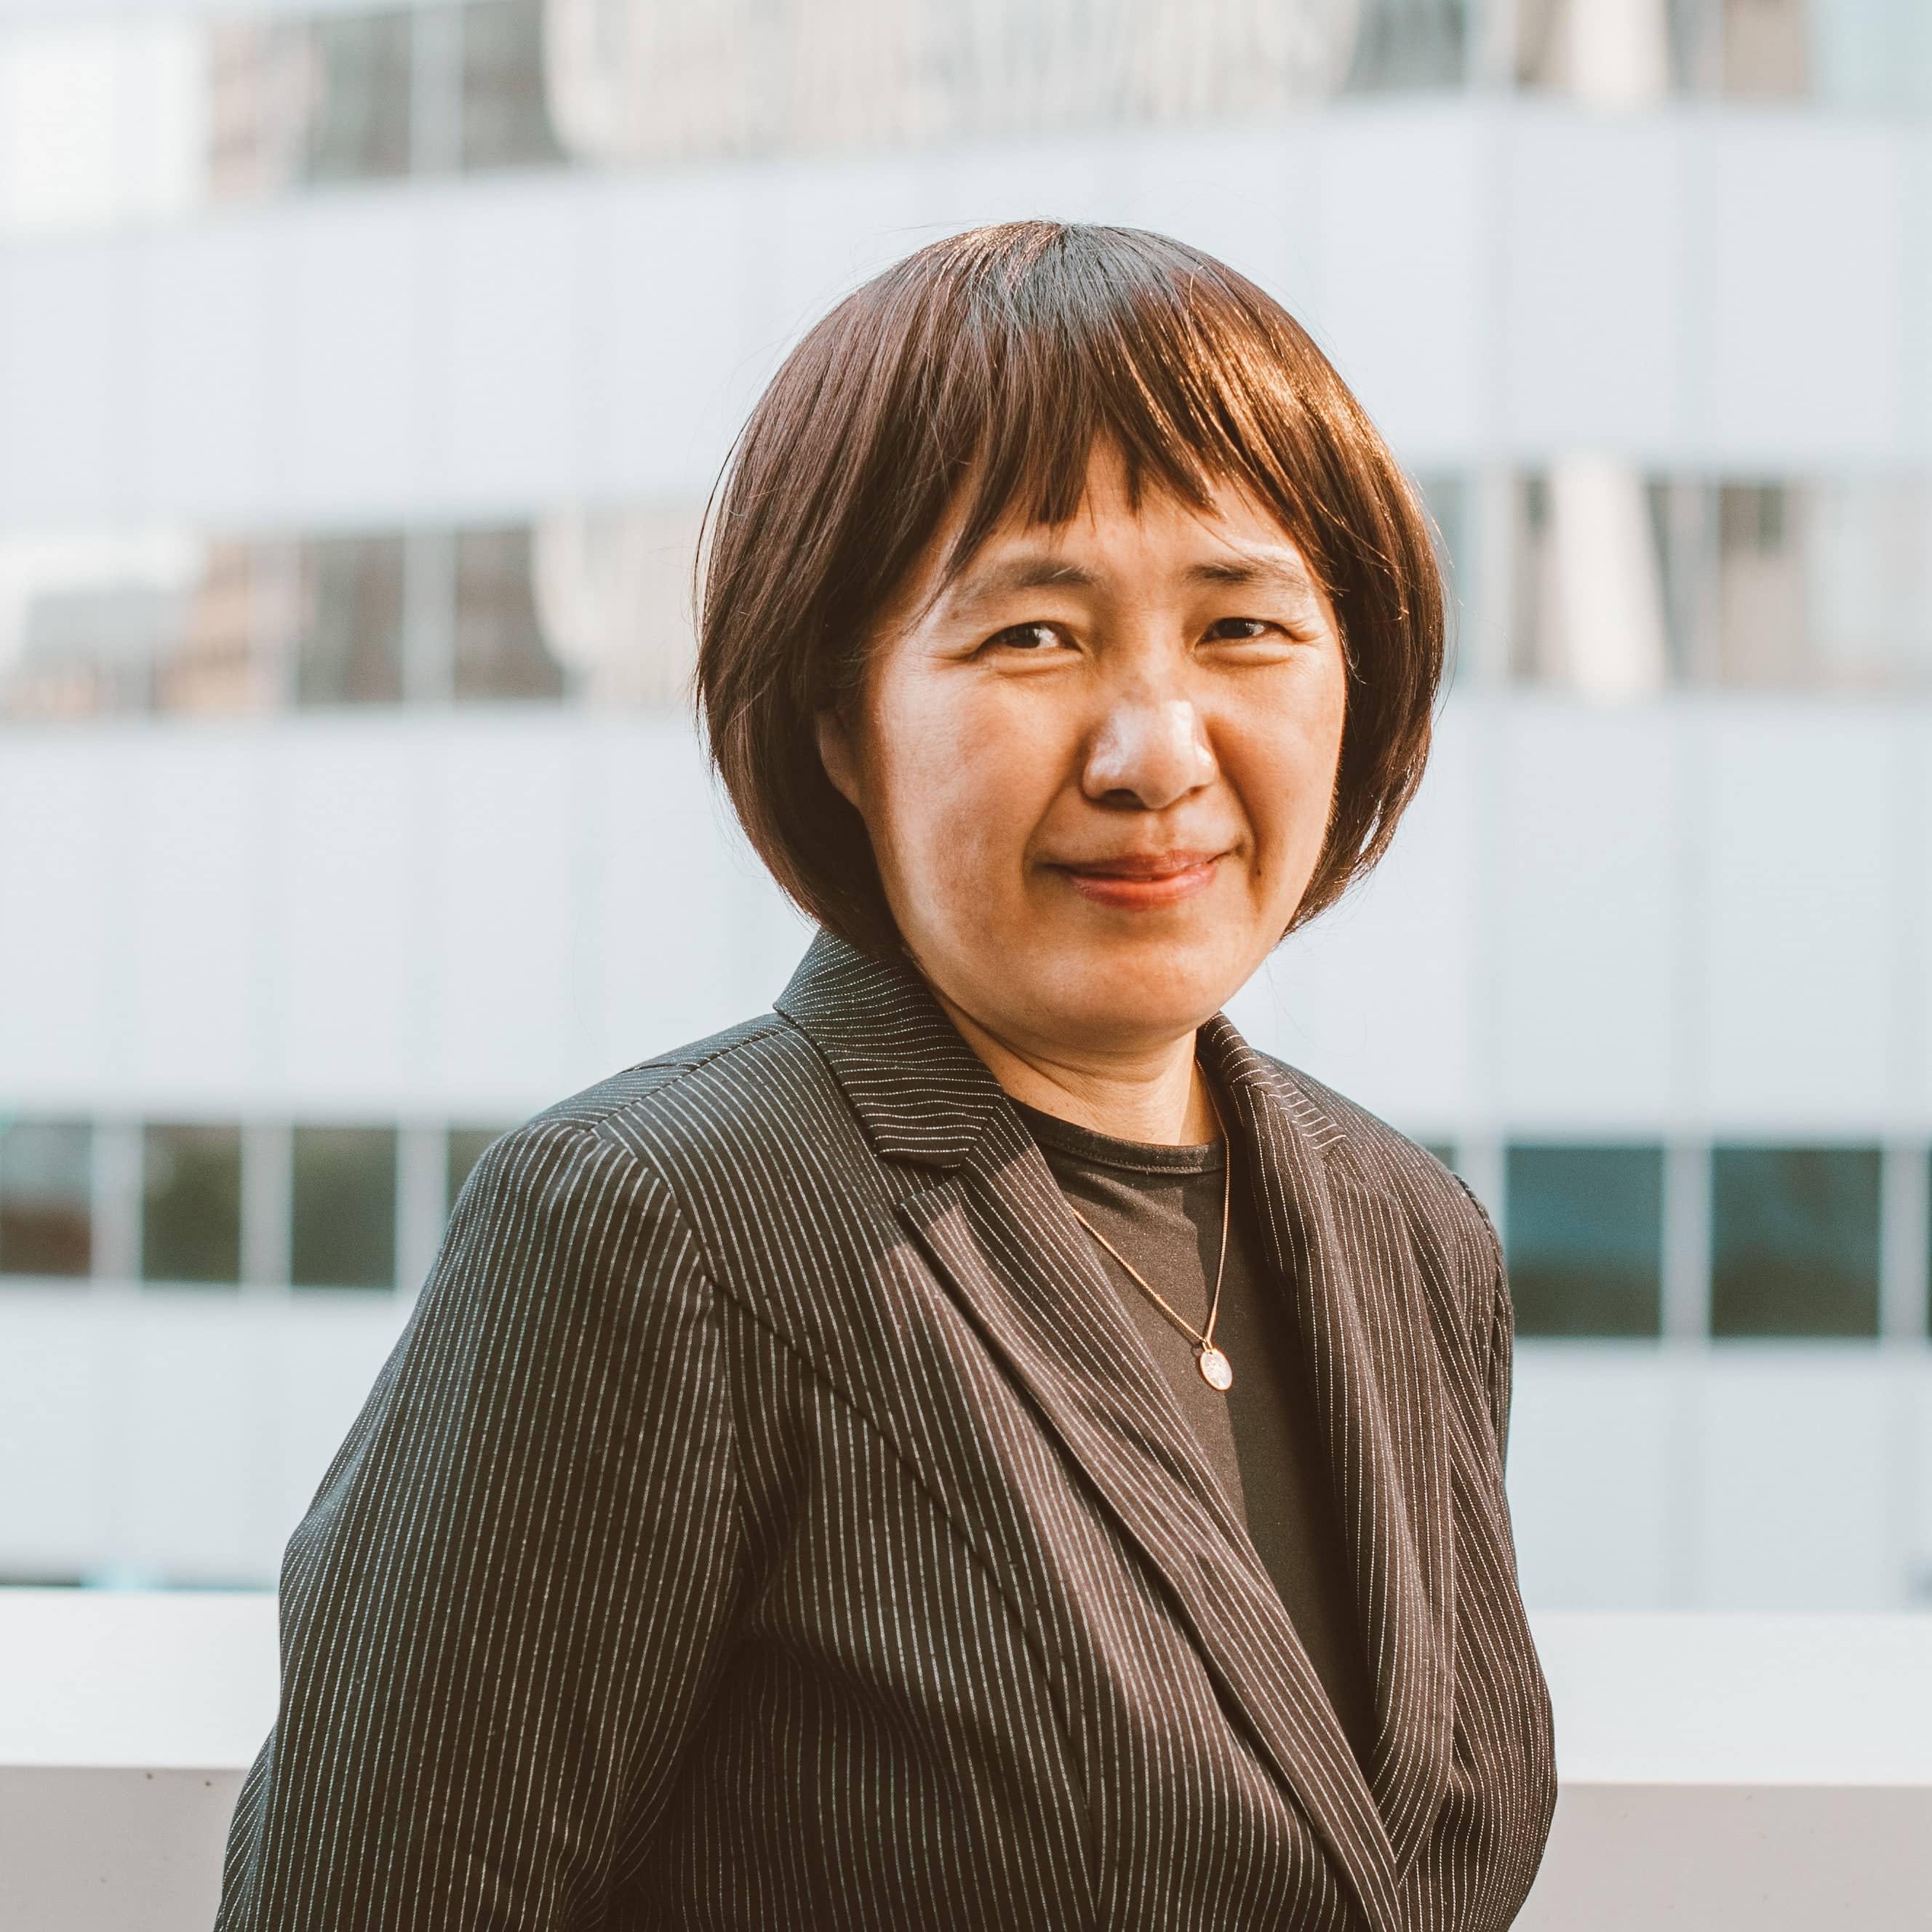 Yvonne Yanqing Han